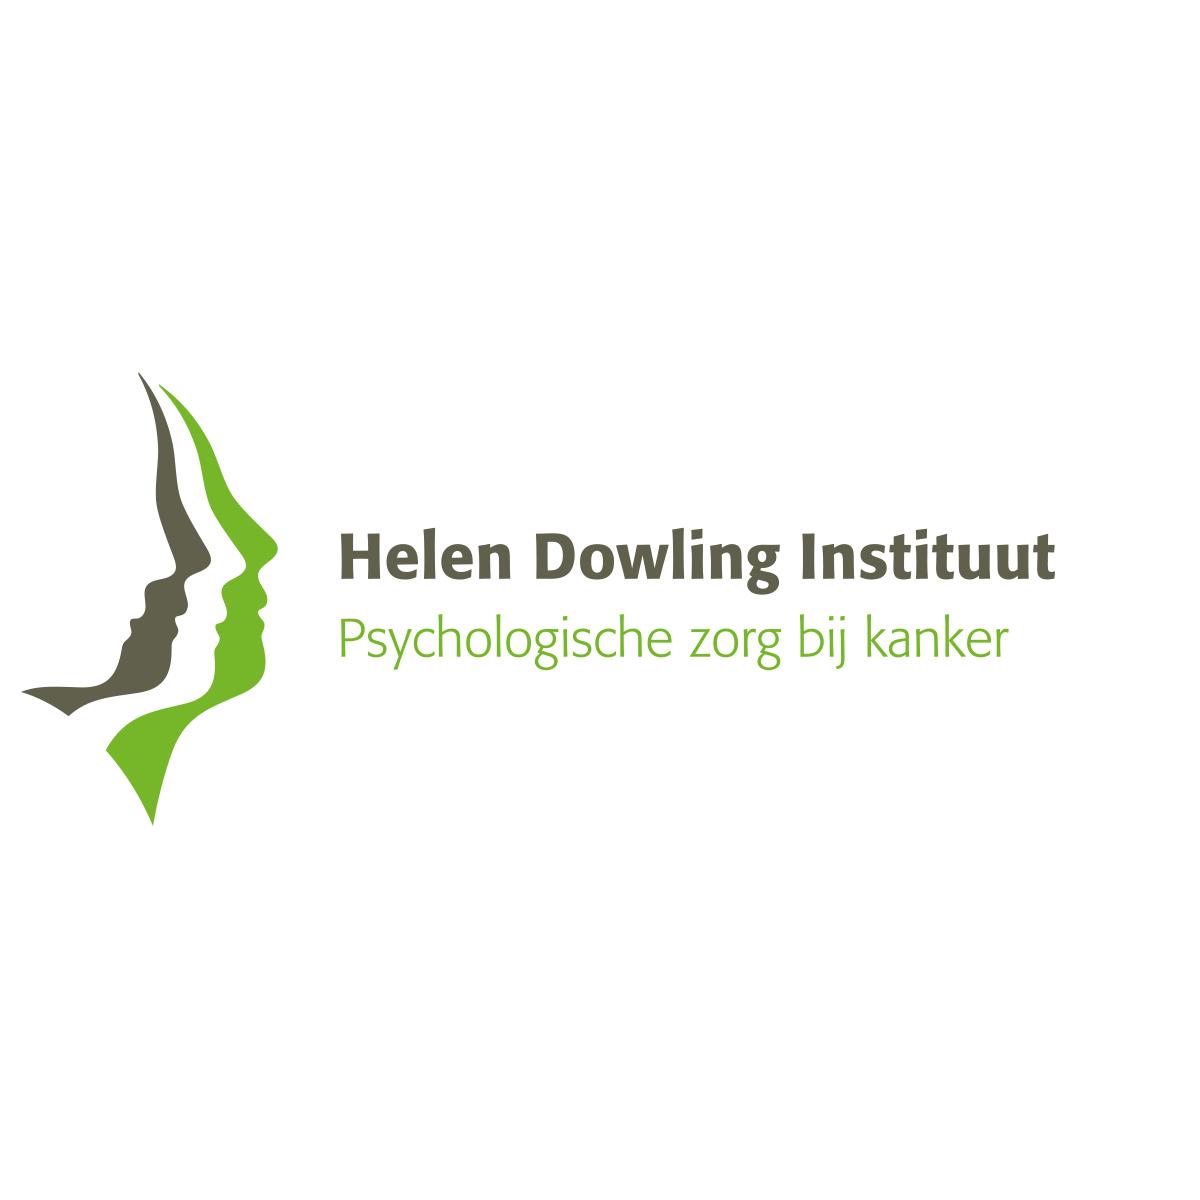 HetHelenDowlingInstituut (HDI)